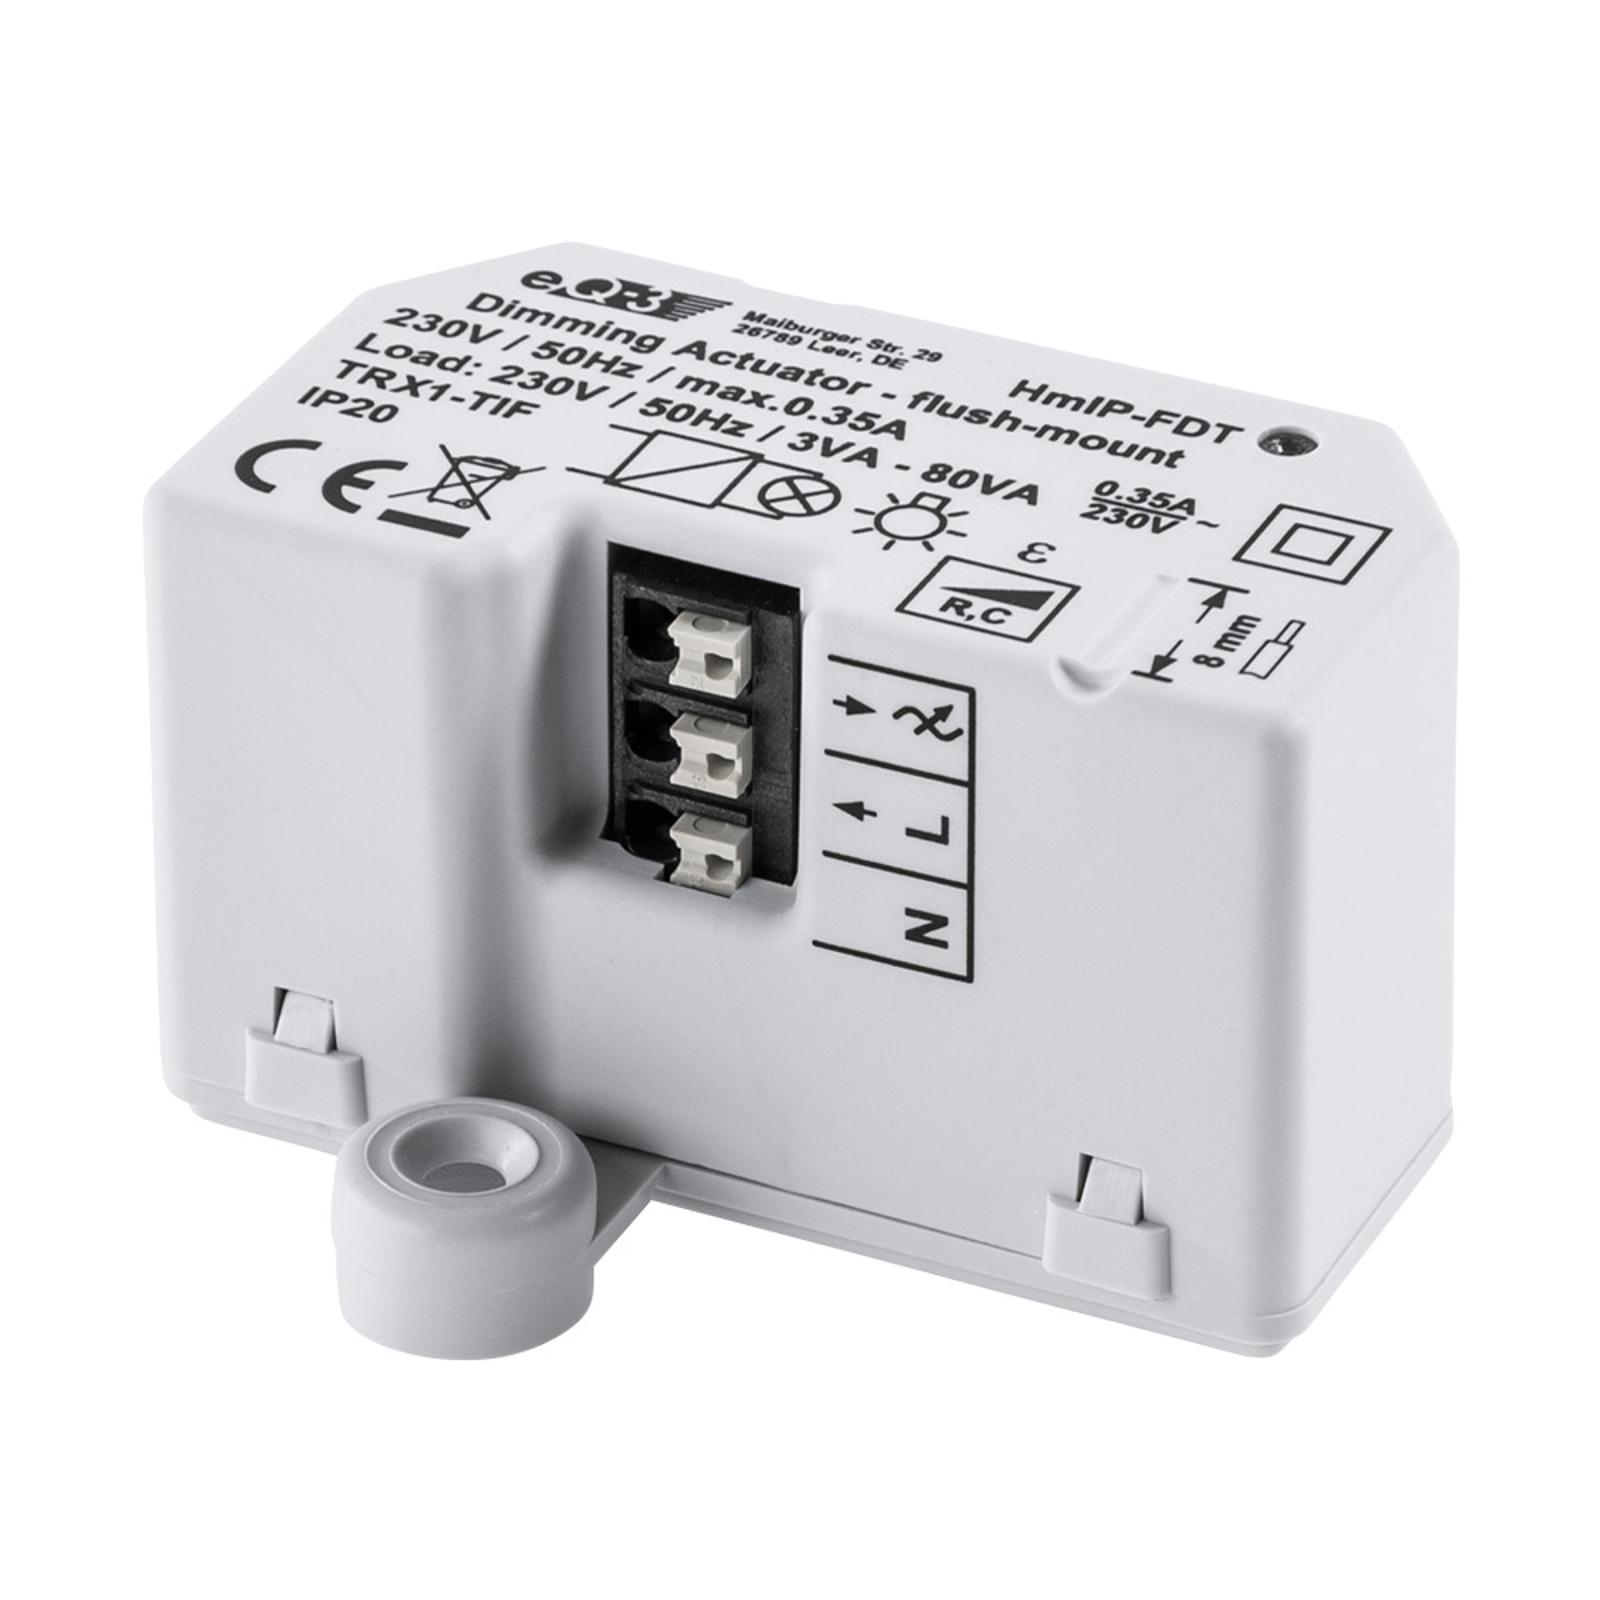 Homematic IP Dimmaktor Phasenabschnitt Gerätedosen